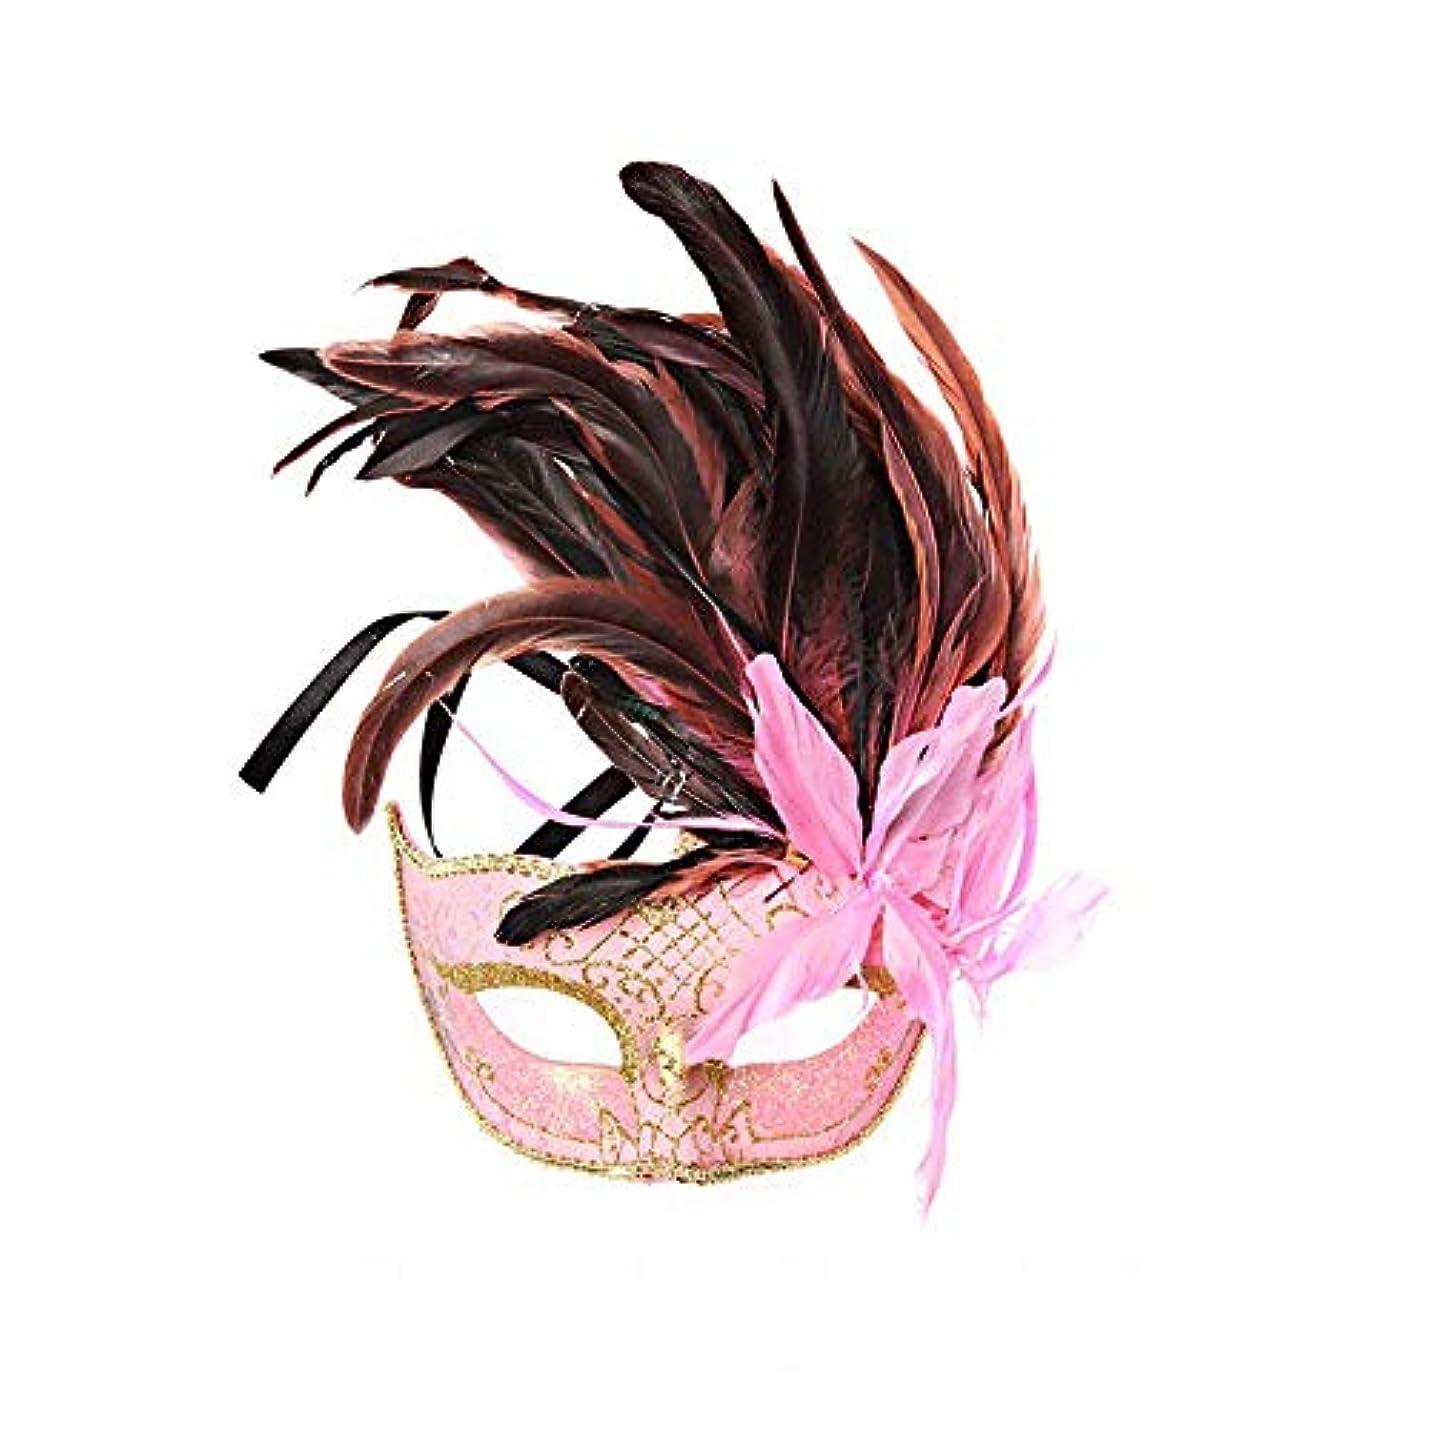 Nanle ハロウィンマスクハーフフェザーマスクベニスプリンセスマスク美容レース仮面ライダーコスプレ (色 : Style A pink)